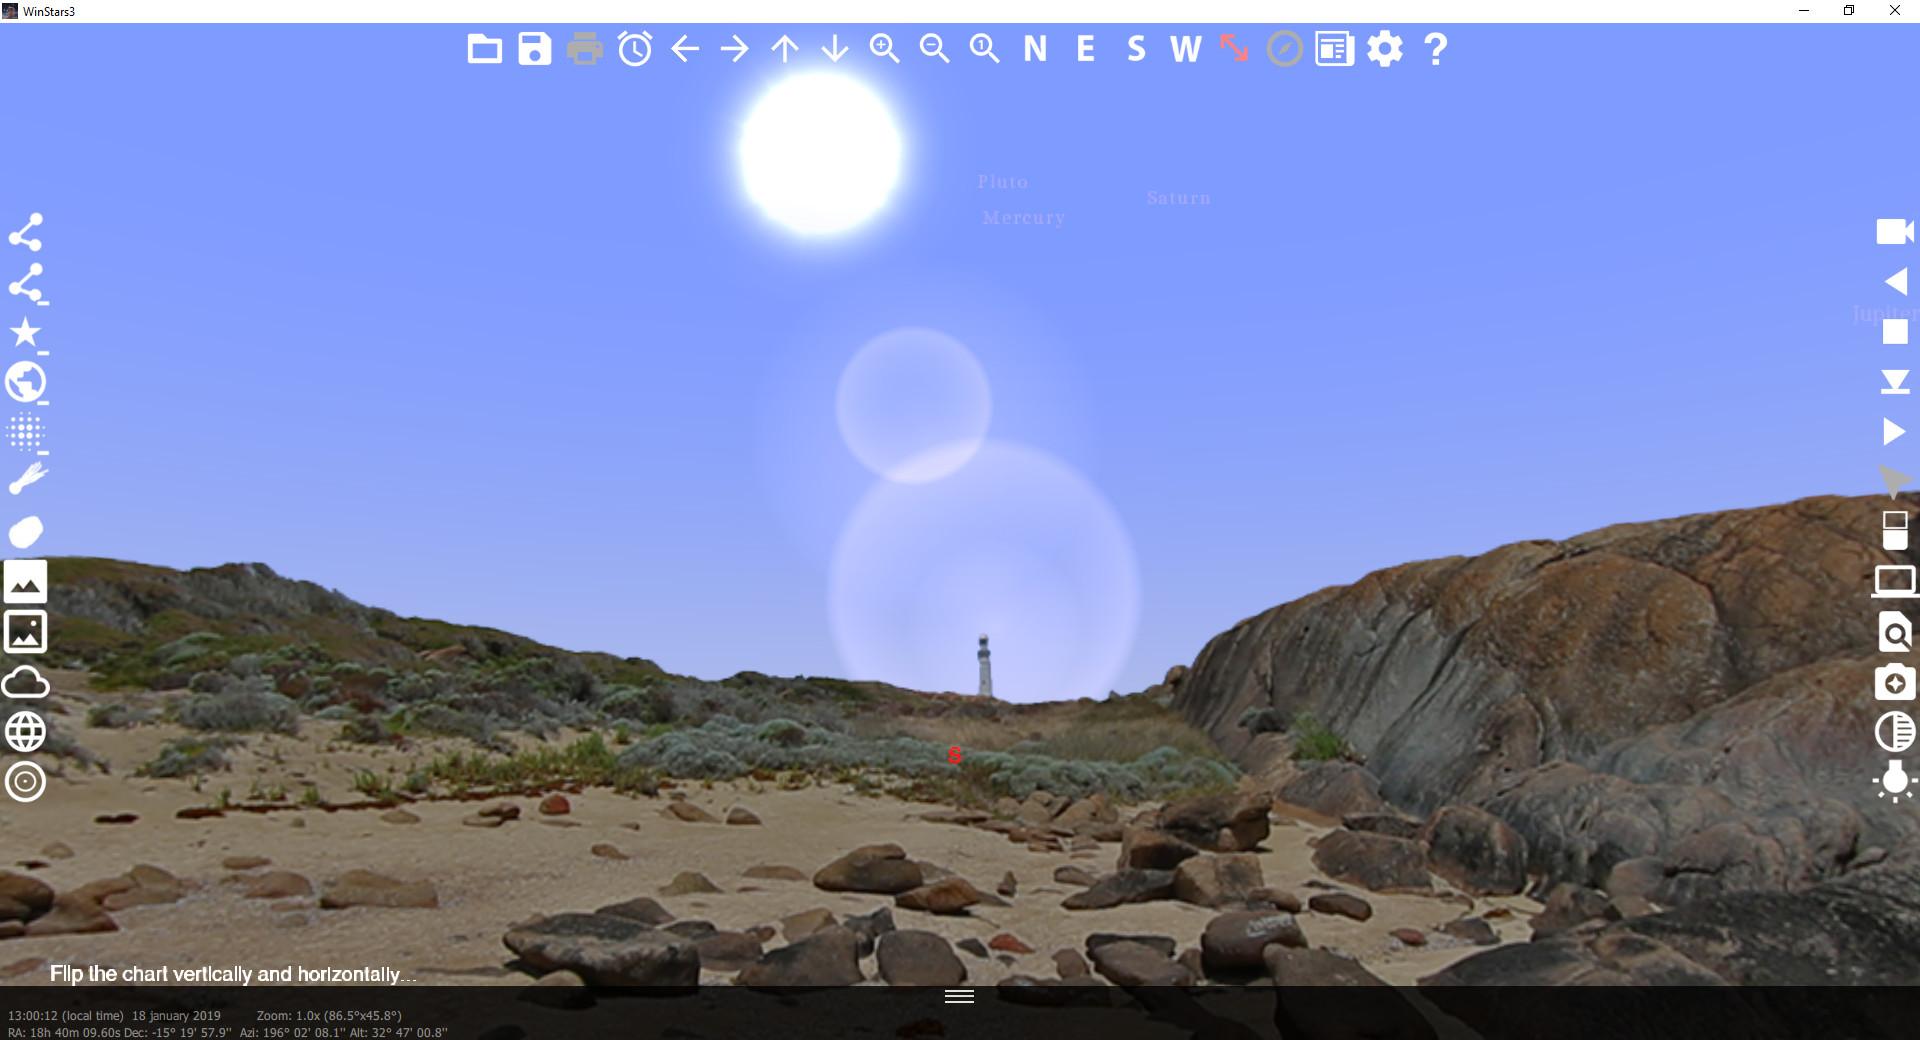 Screenshot 1 - WinStars